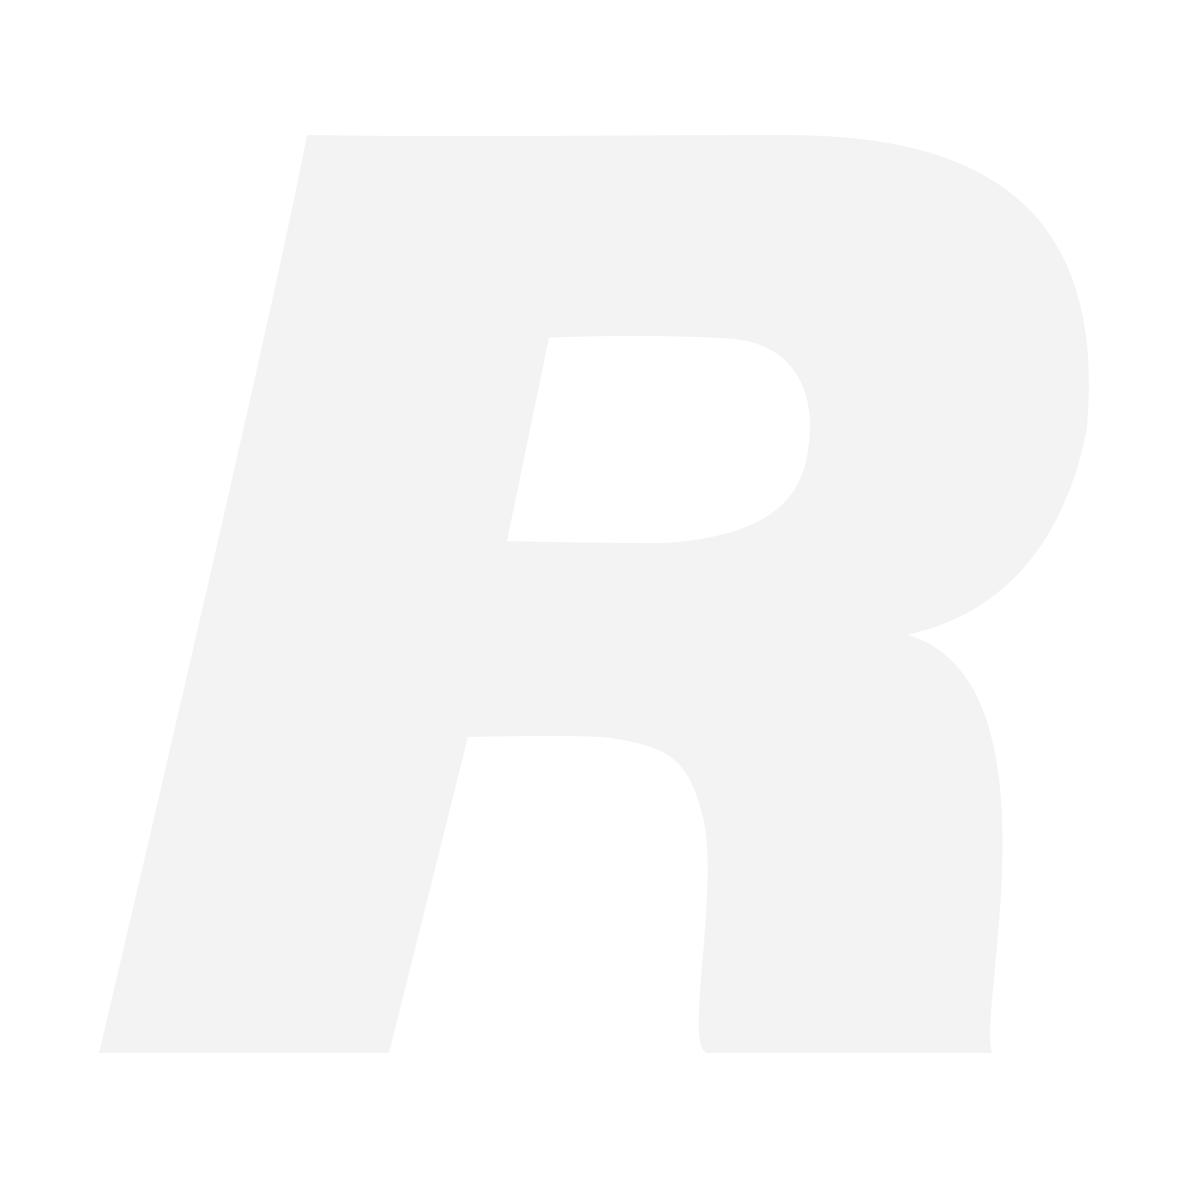 GoPro komposiittikaapeli (HERO 3, HERO 3+, HERO 4)